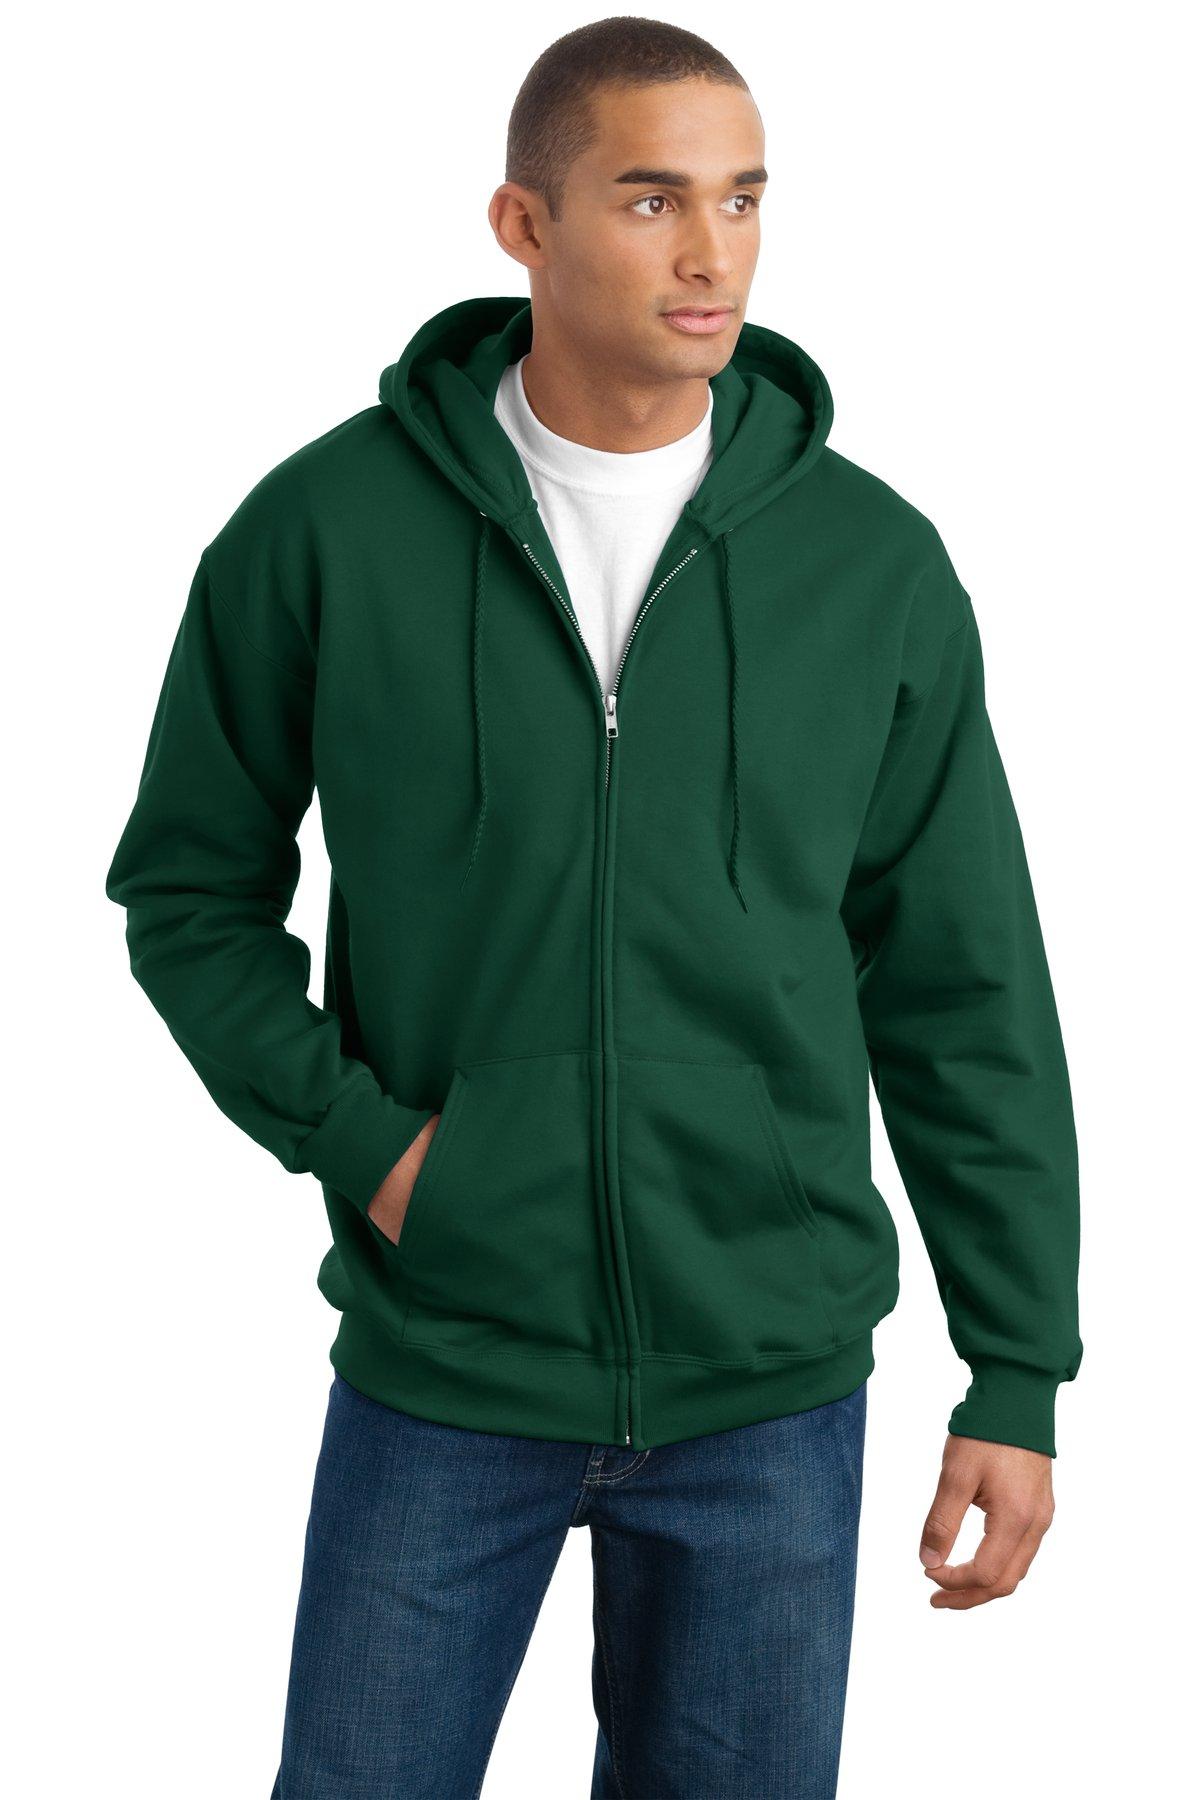 Hanes Ultimate Cotton - Full-Zip Hooded Sweatshirt. F283